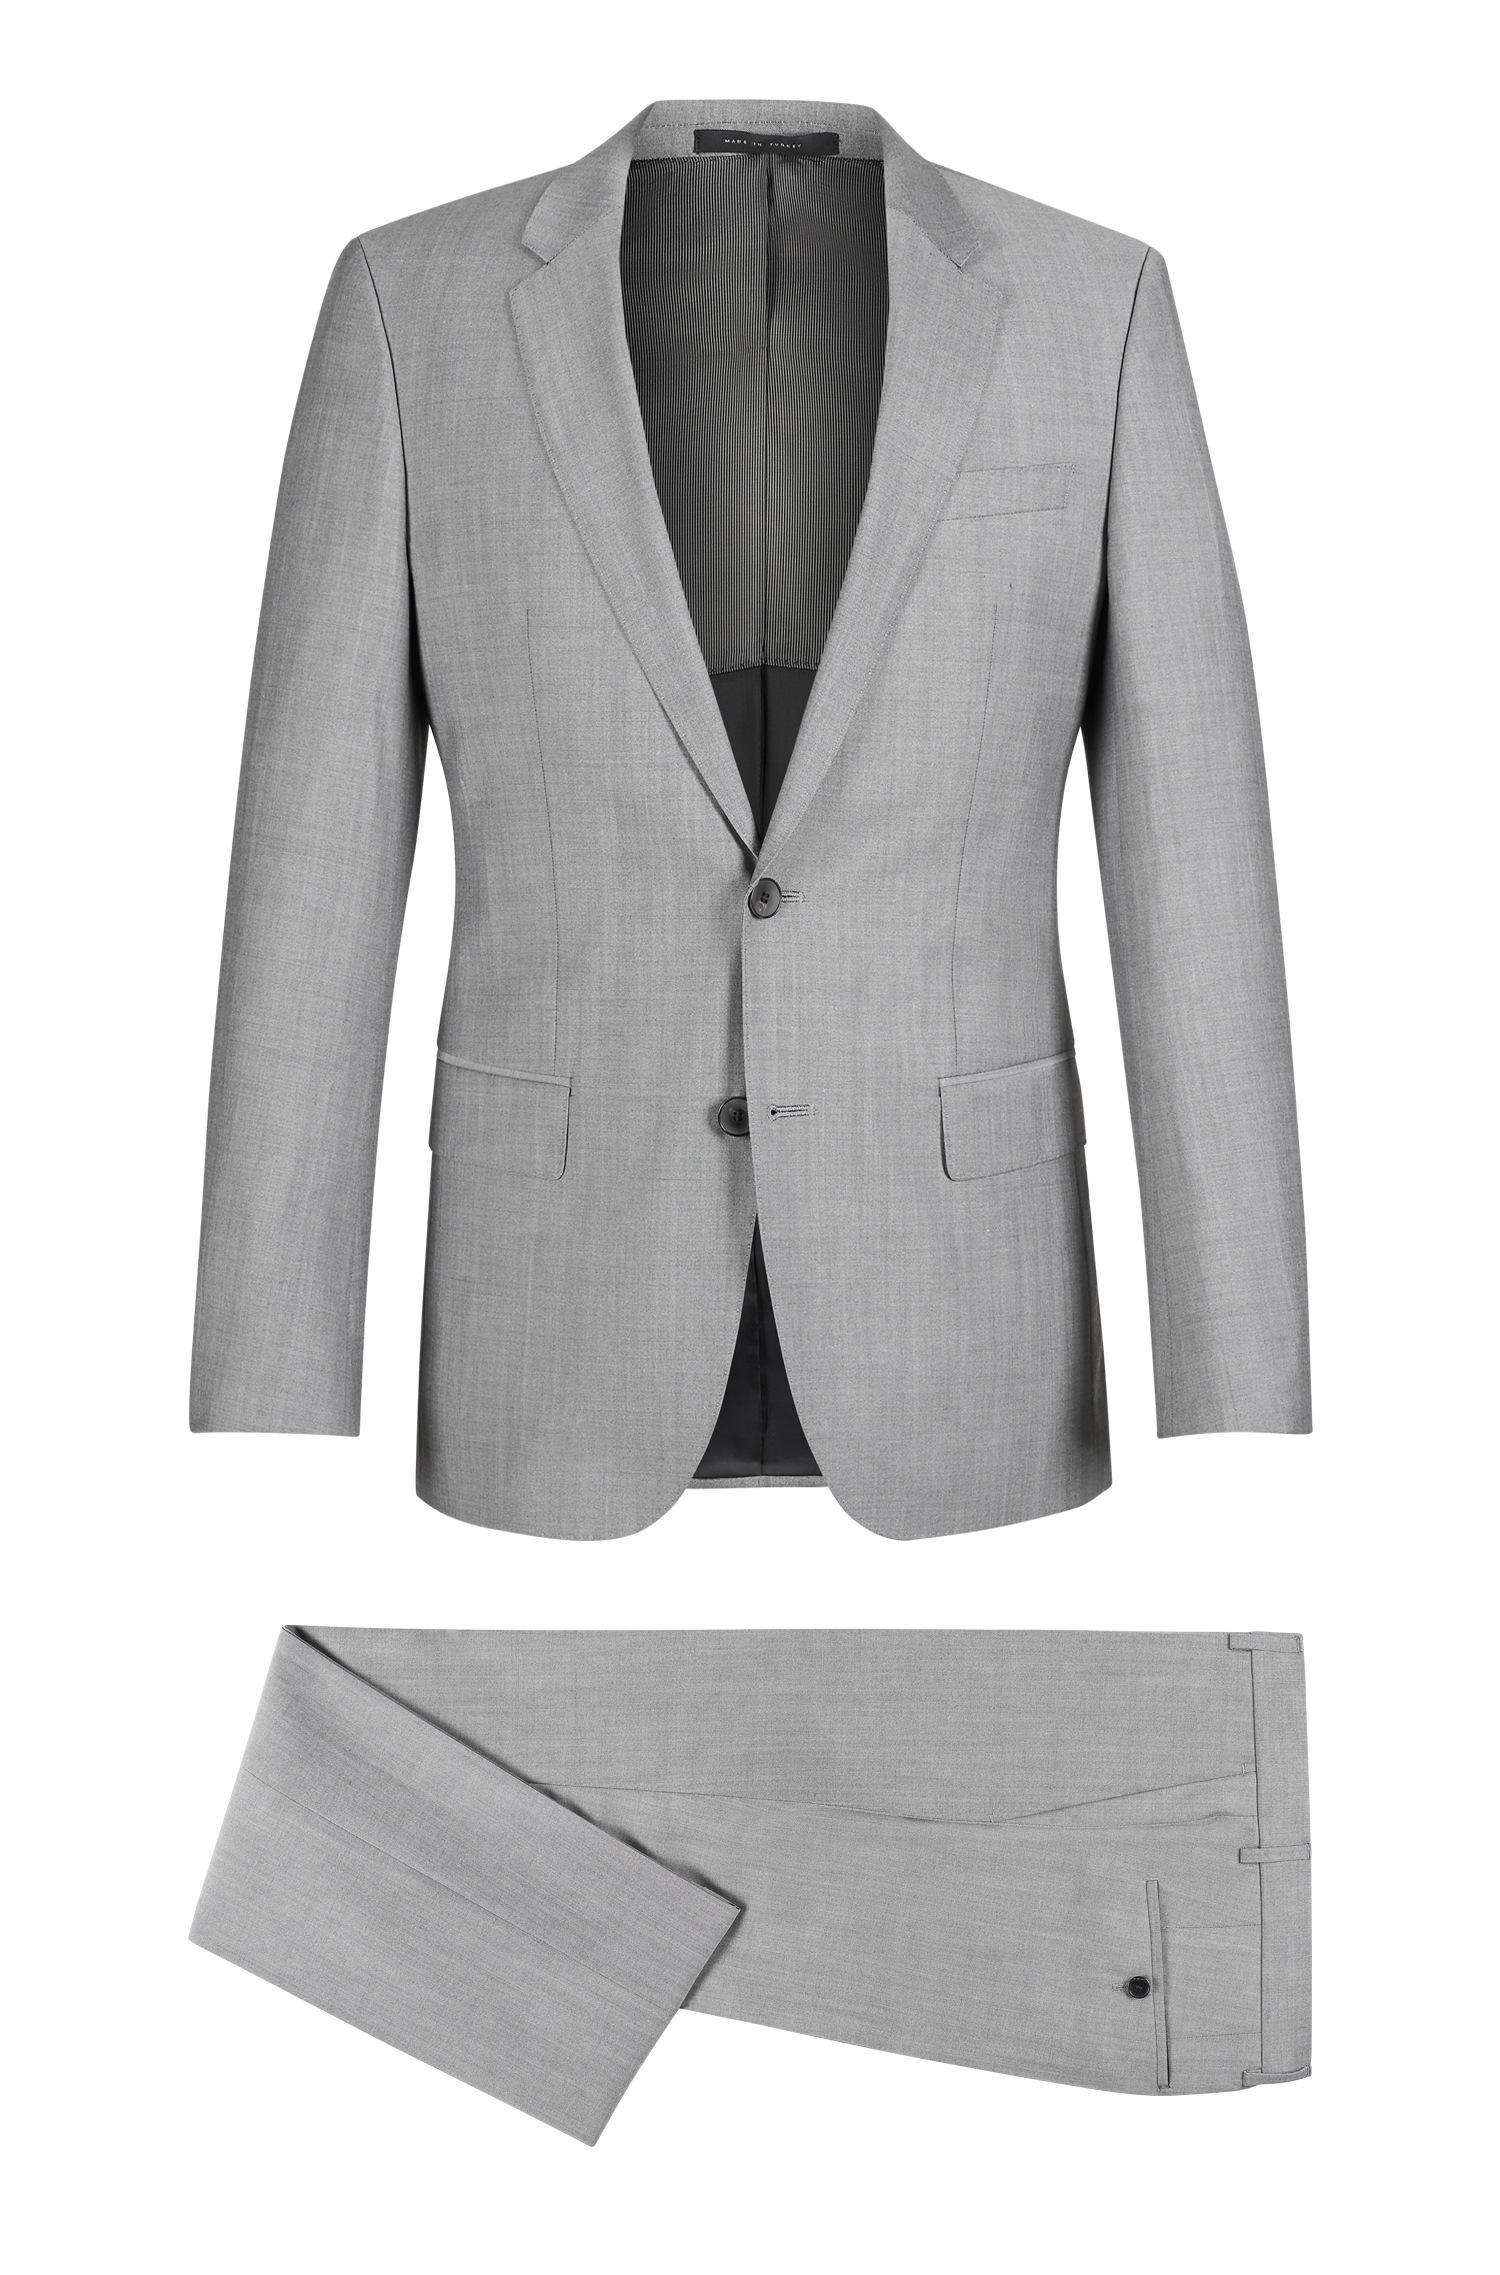 331b53f9 BOSS. Men's Gray Italian Super 110 Virgin Wool Suit, Slim Fit | Huge/genius